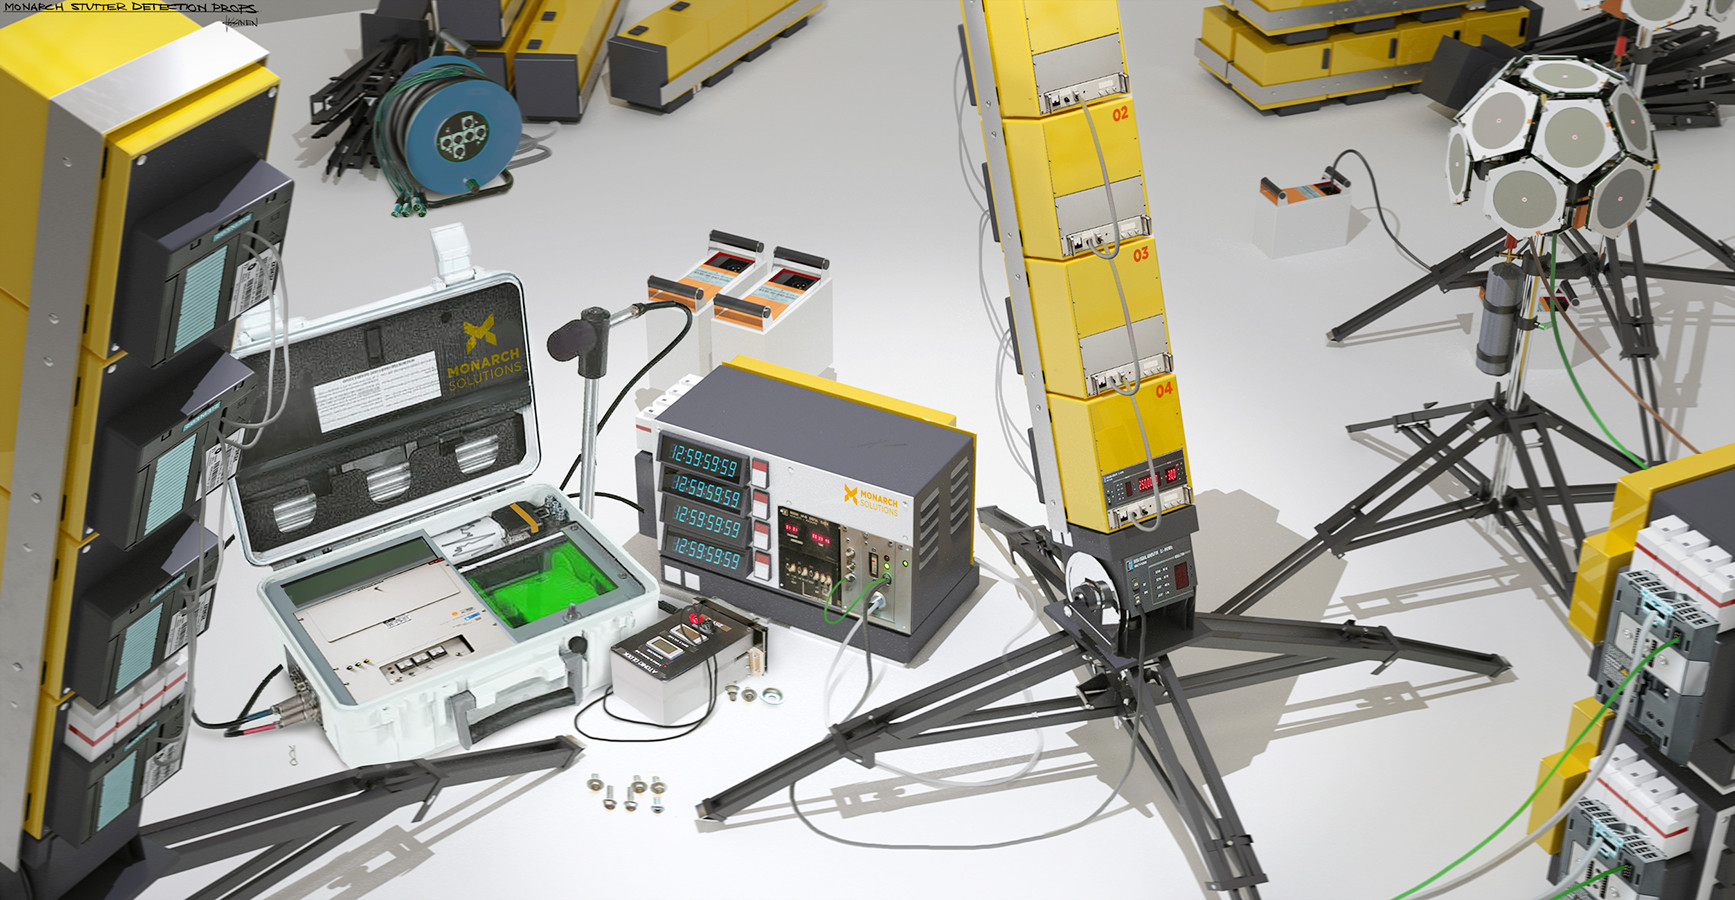 Ville assinen stutter detector props concept 001